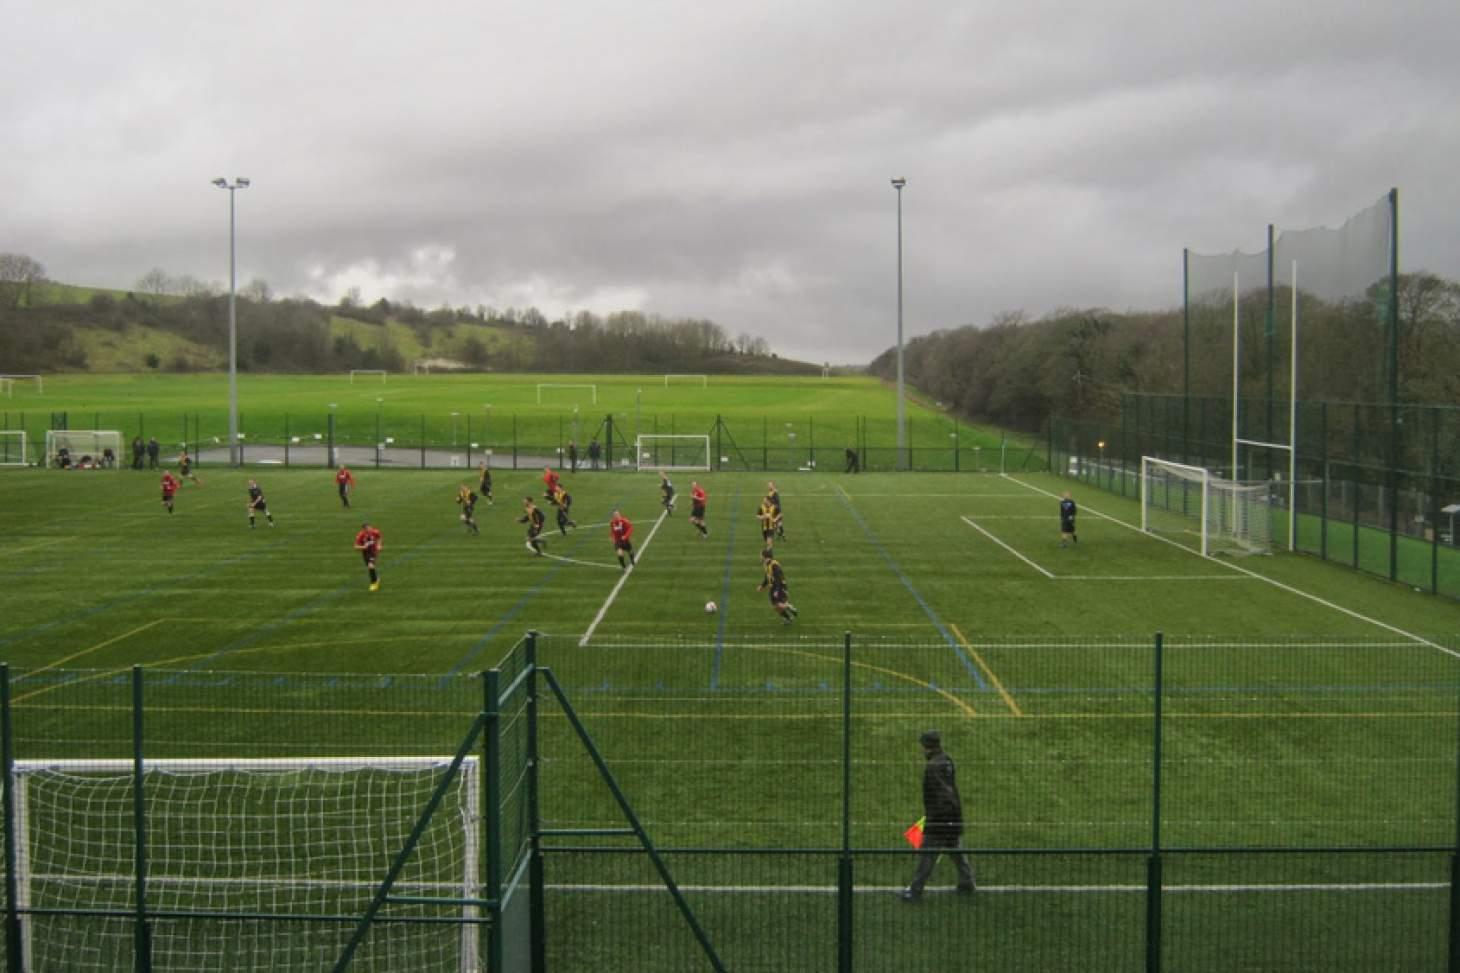 University Of Brighton (Falmer Campus) 7 a side | 3G Astroturf football pitch